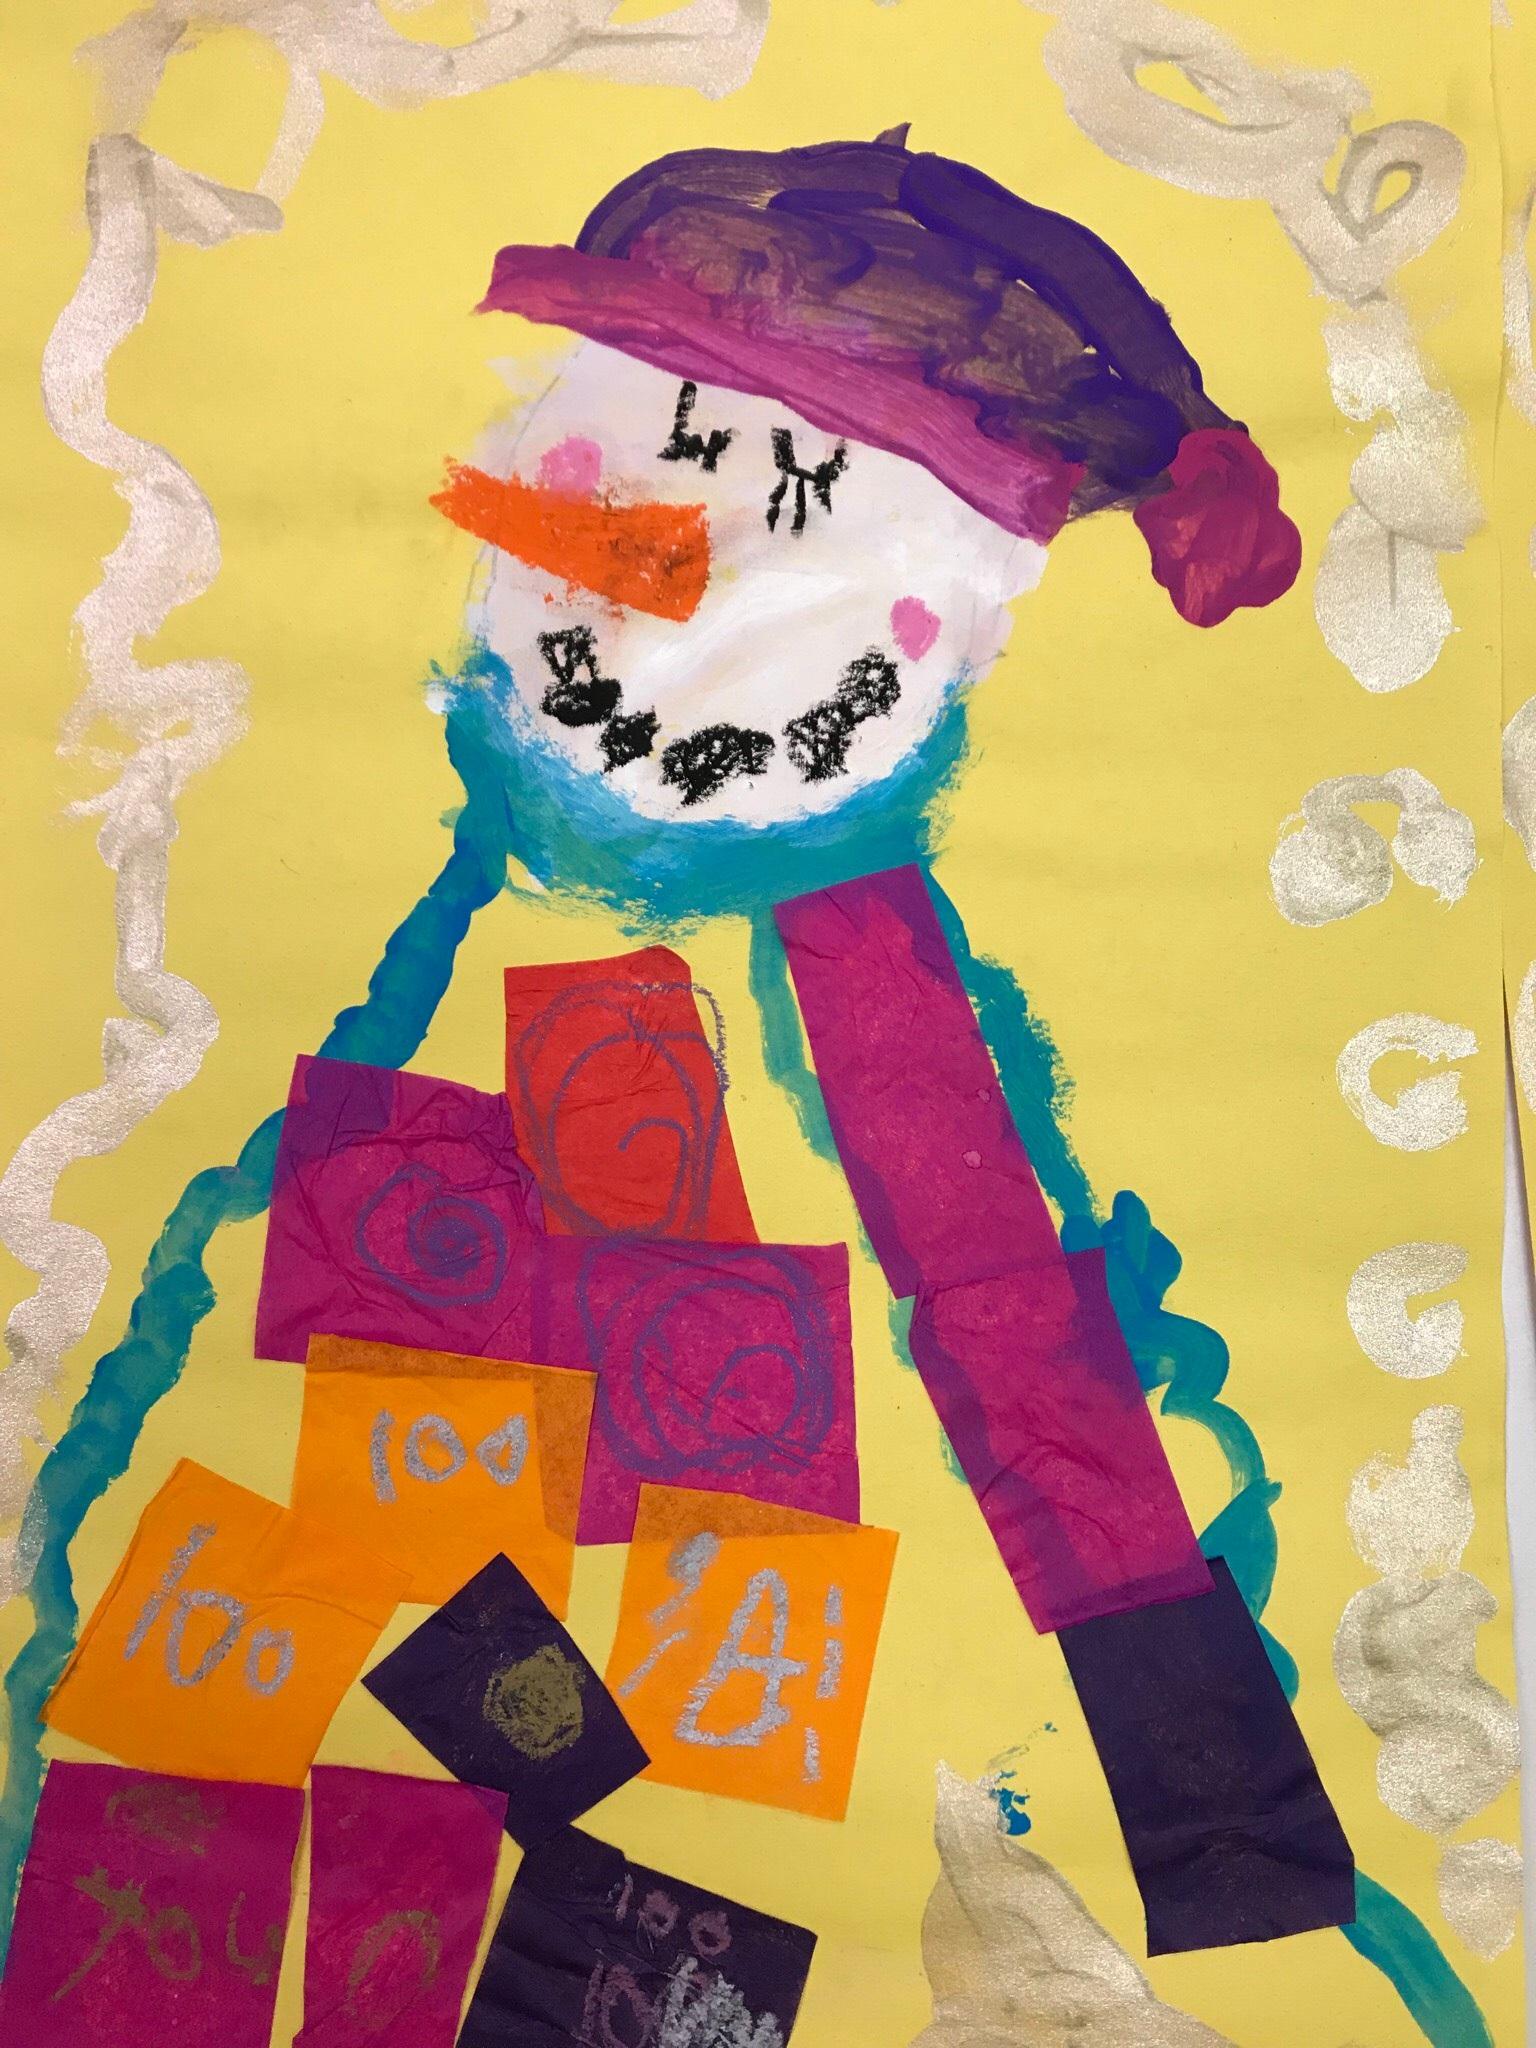 Klimt inspired snowman from a kindergarten student